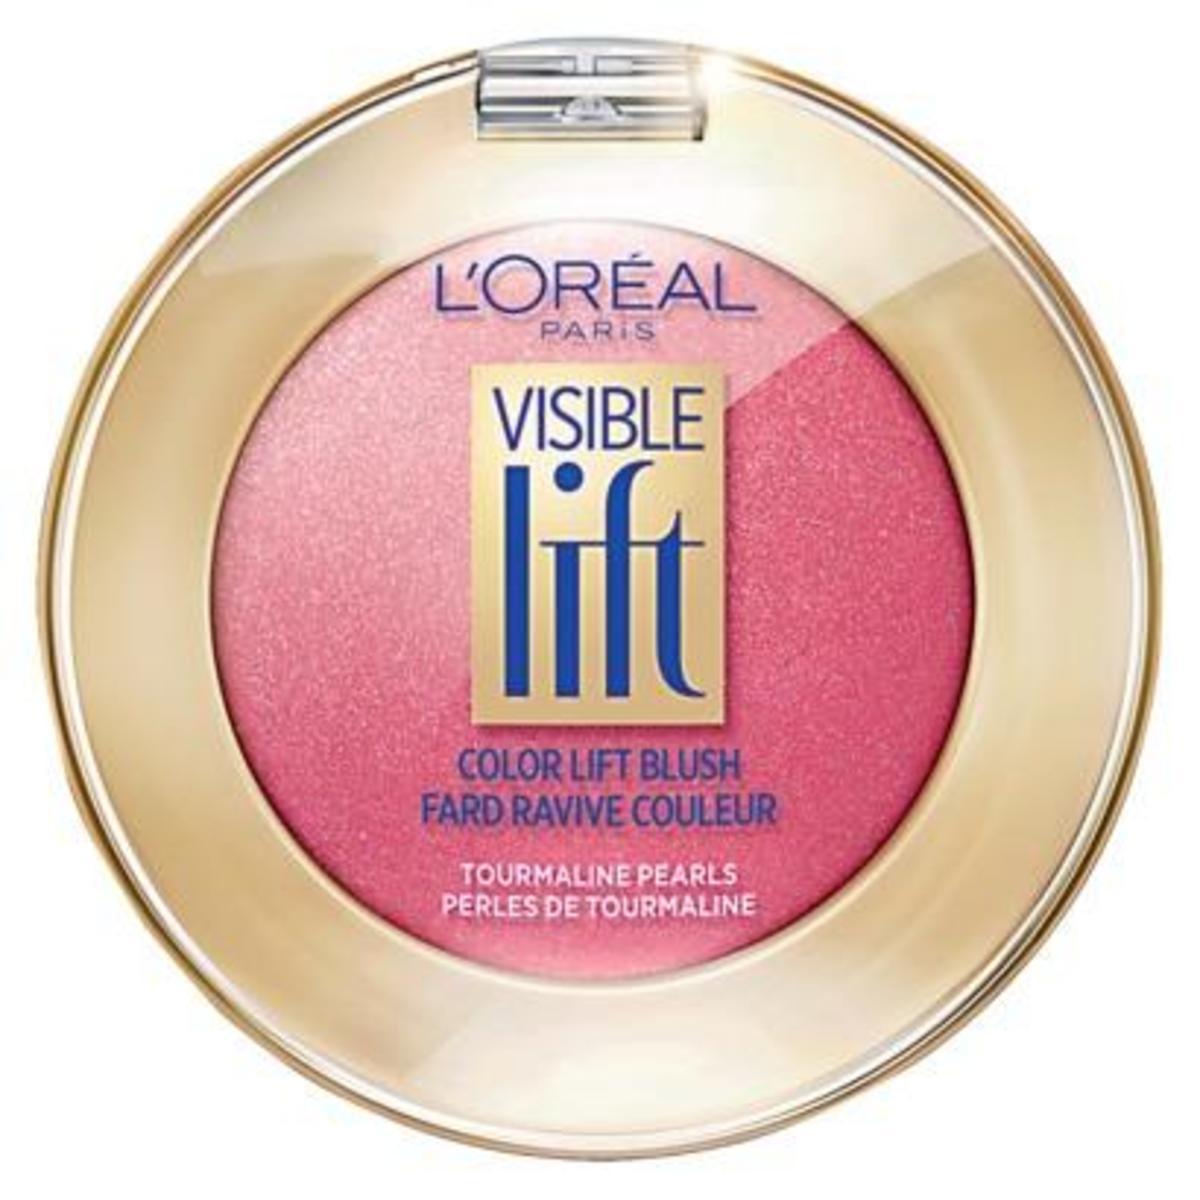 L'Oreal Paris Visible Lift Blush in Pink Lift